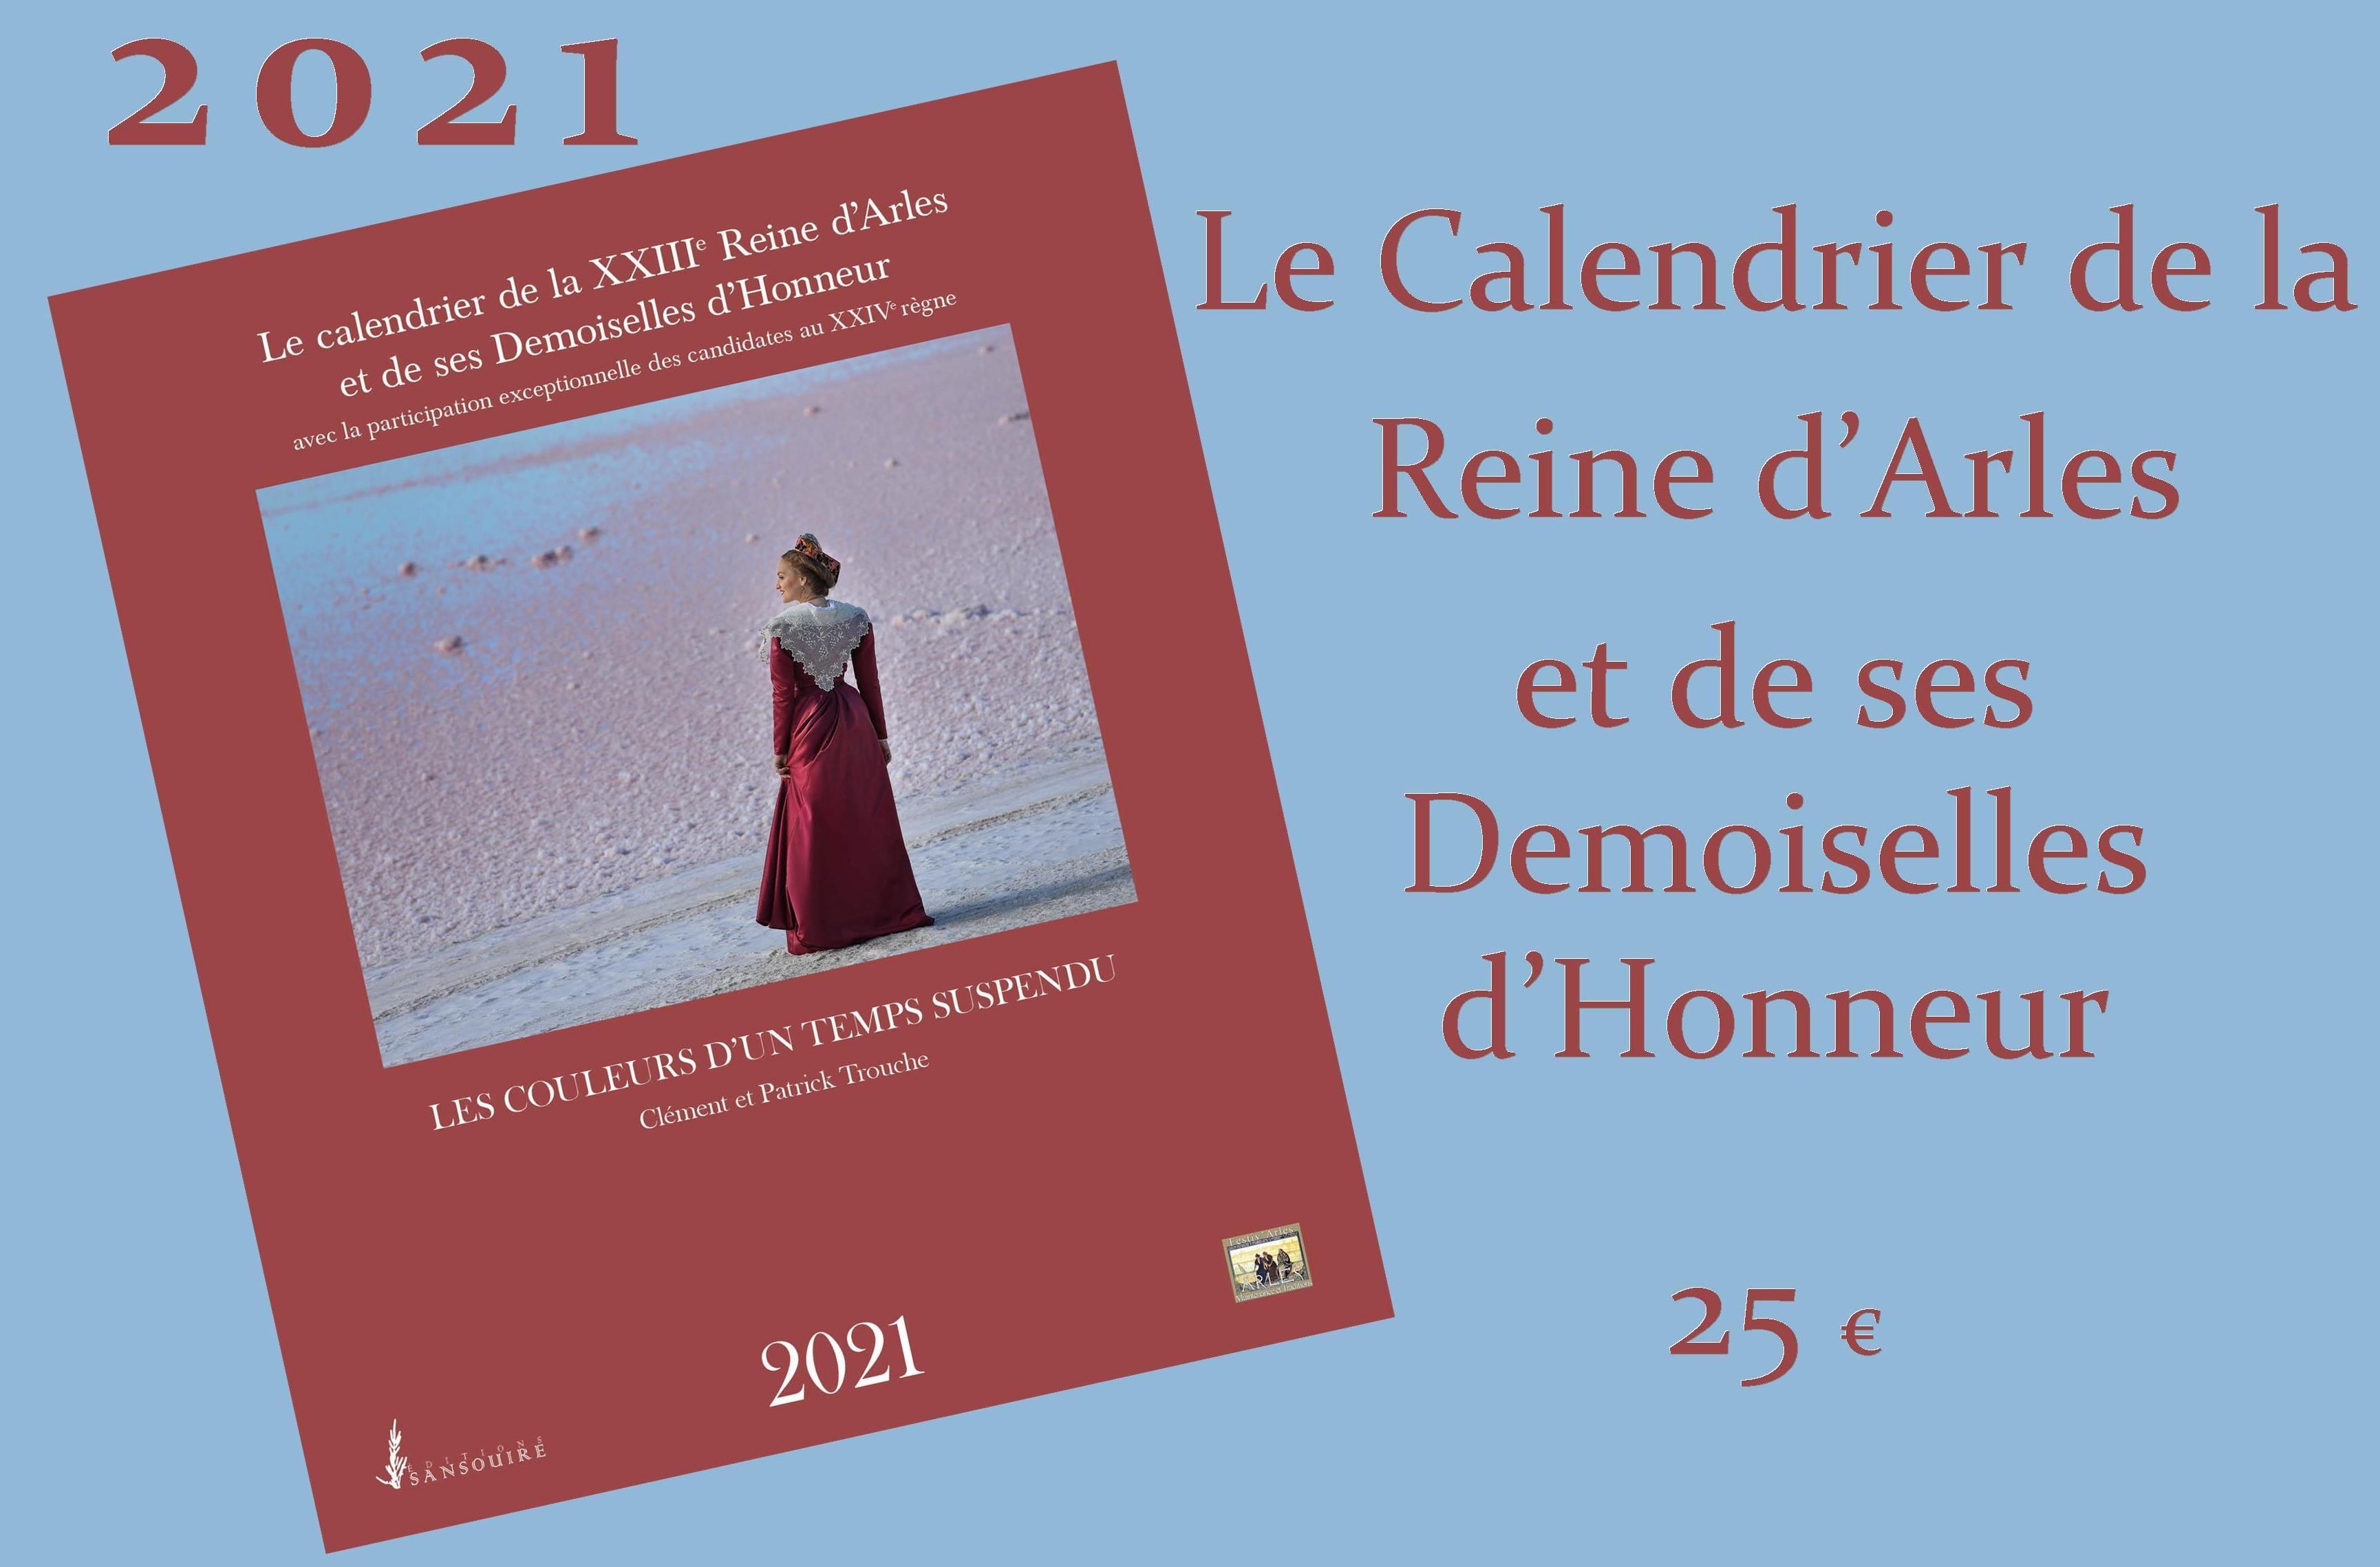 Course Camarguaise Calendrier 2021 Festiv'arles   maintenance et traditions   Arles   Festiv'Arles